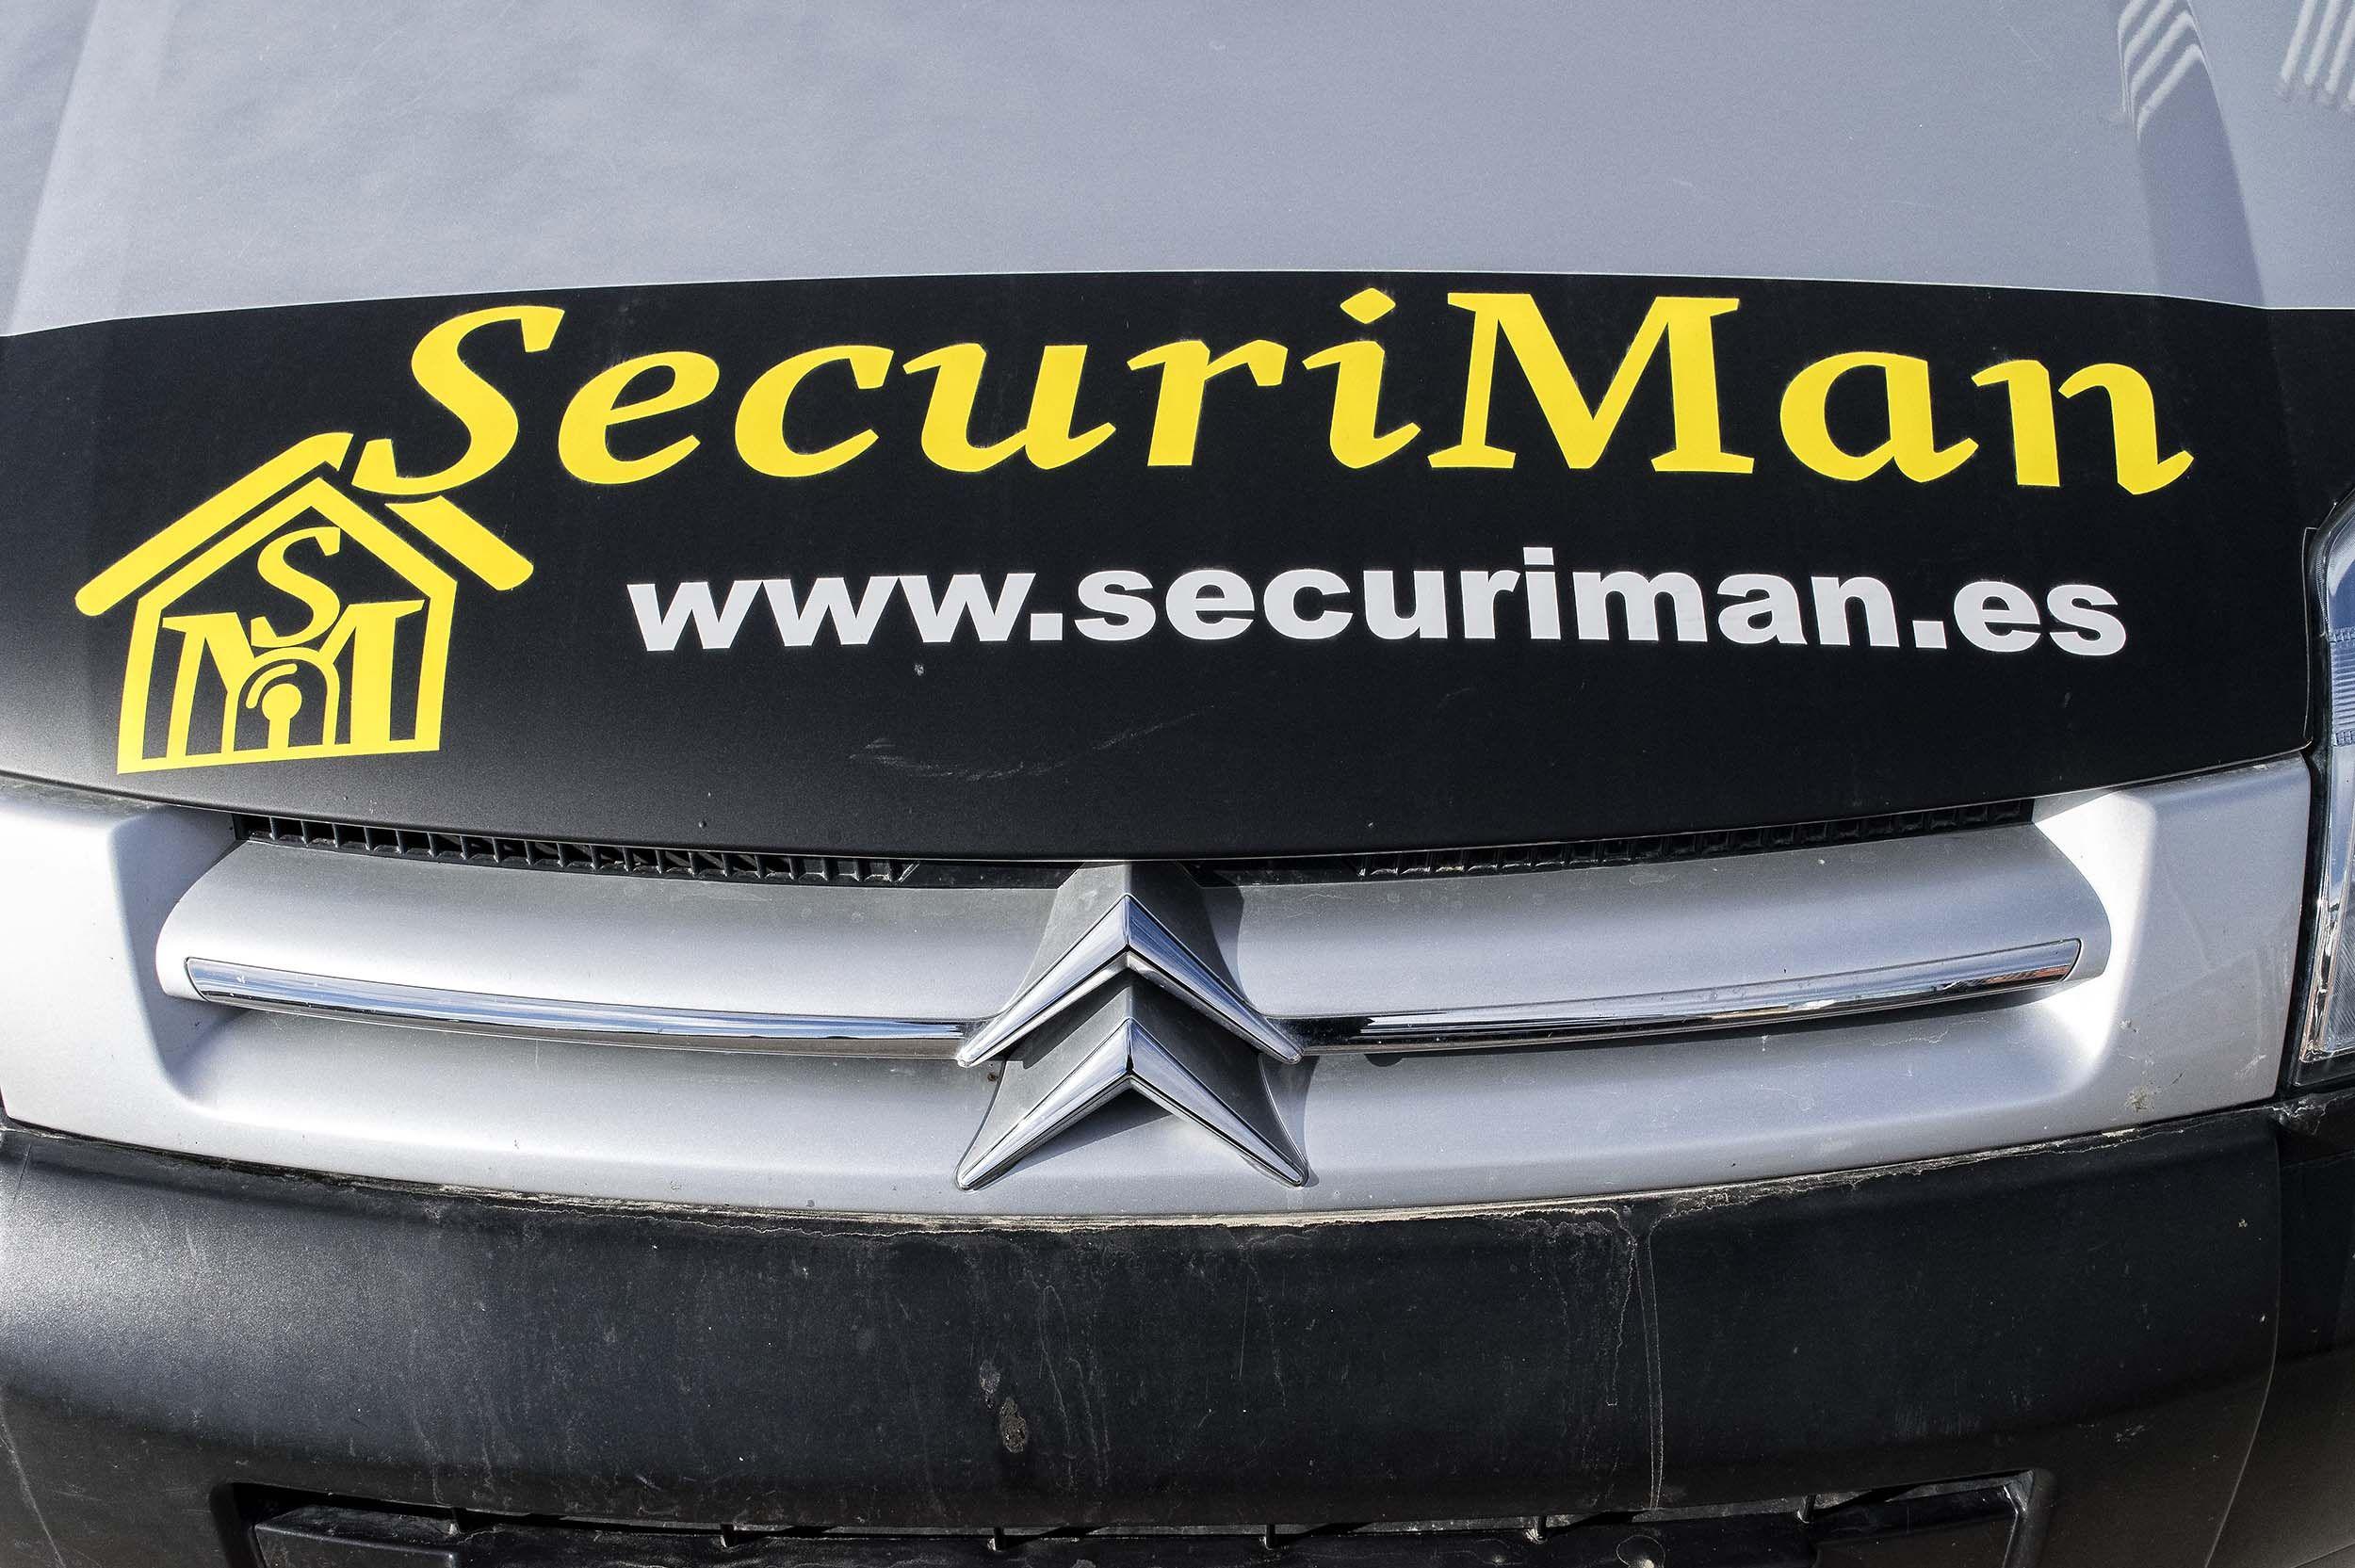 SecuriMan